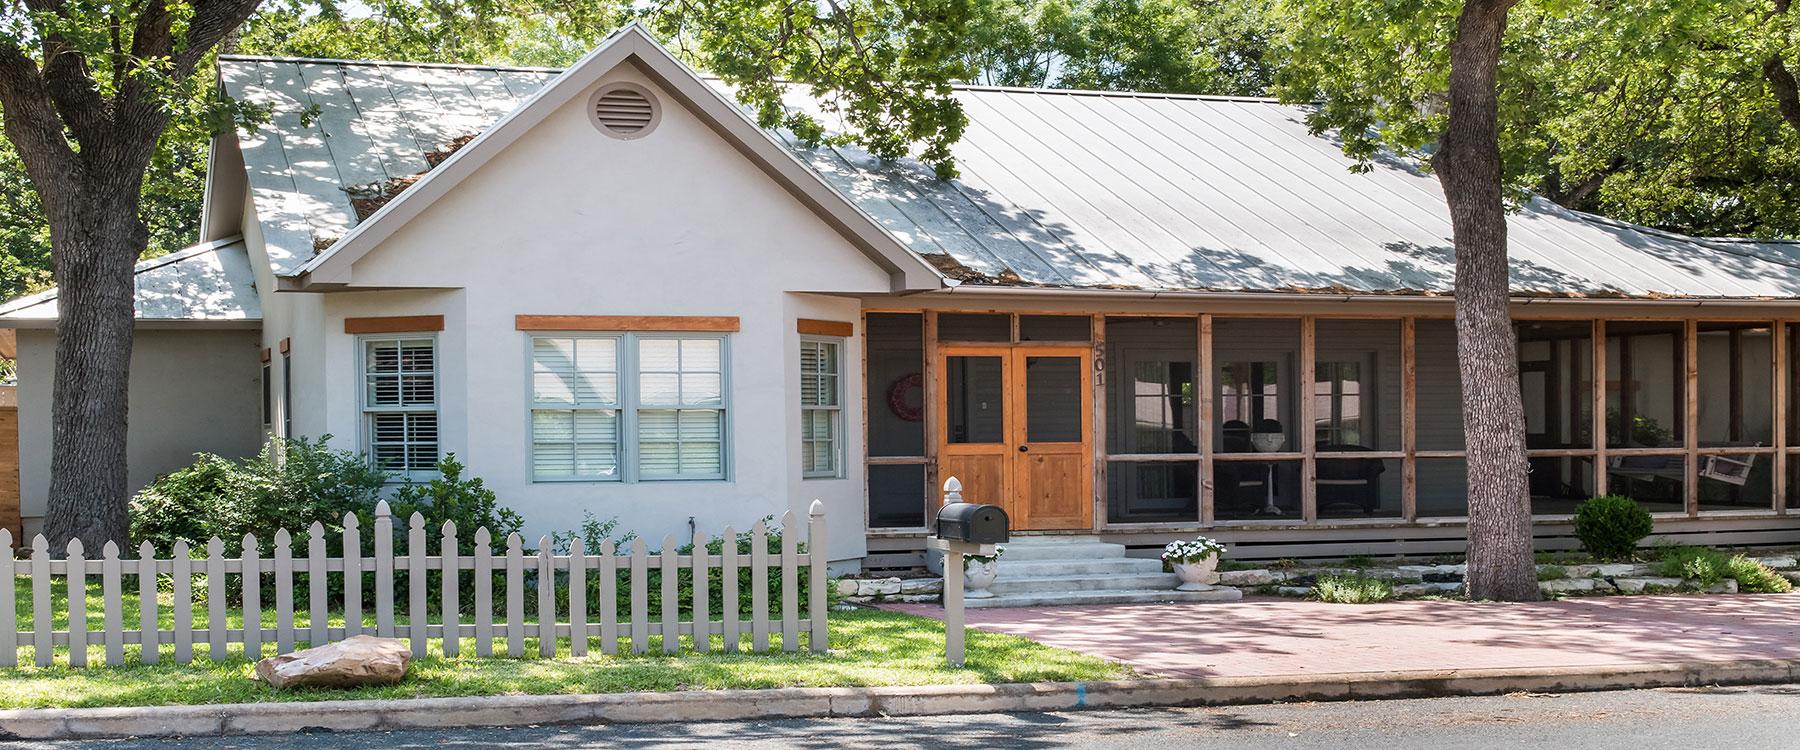 Absolute Charm Real Estate: Fredericksburg TX Real Estate